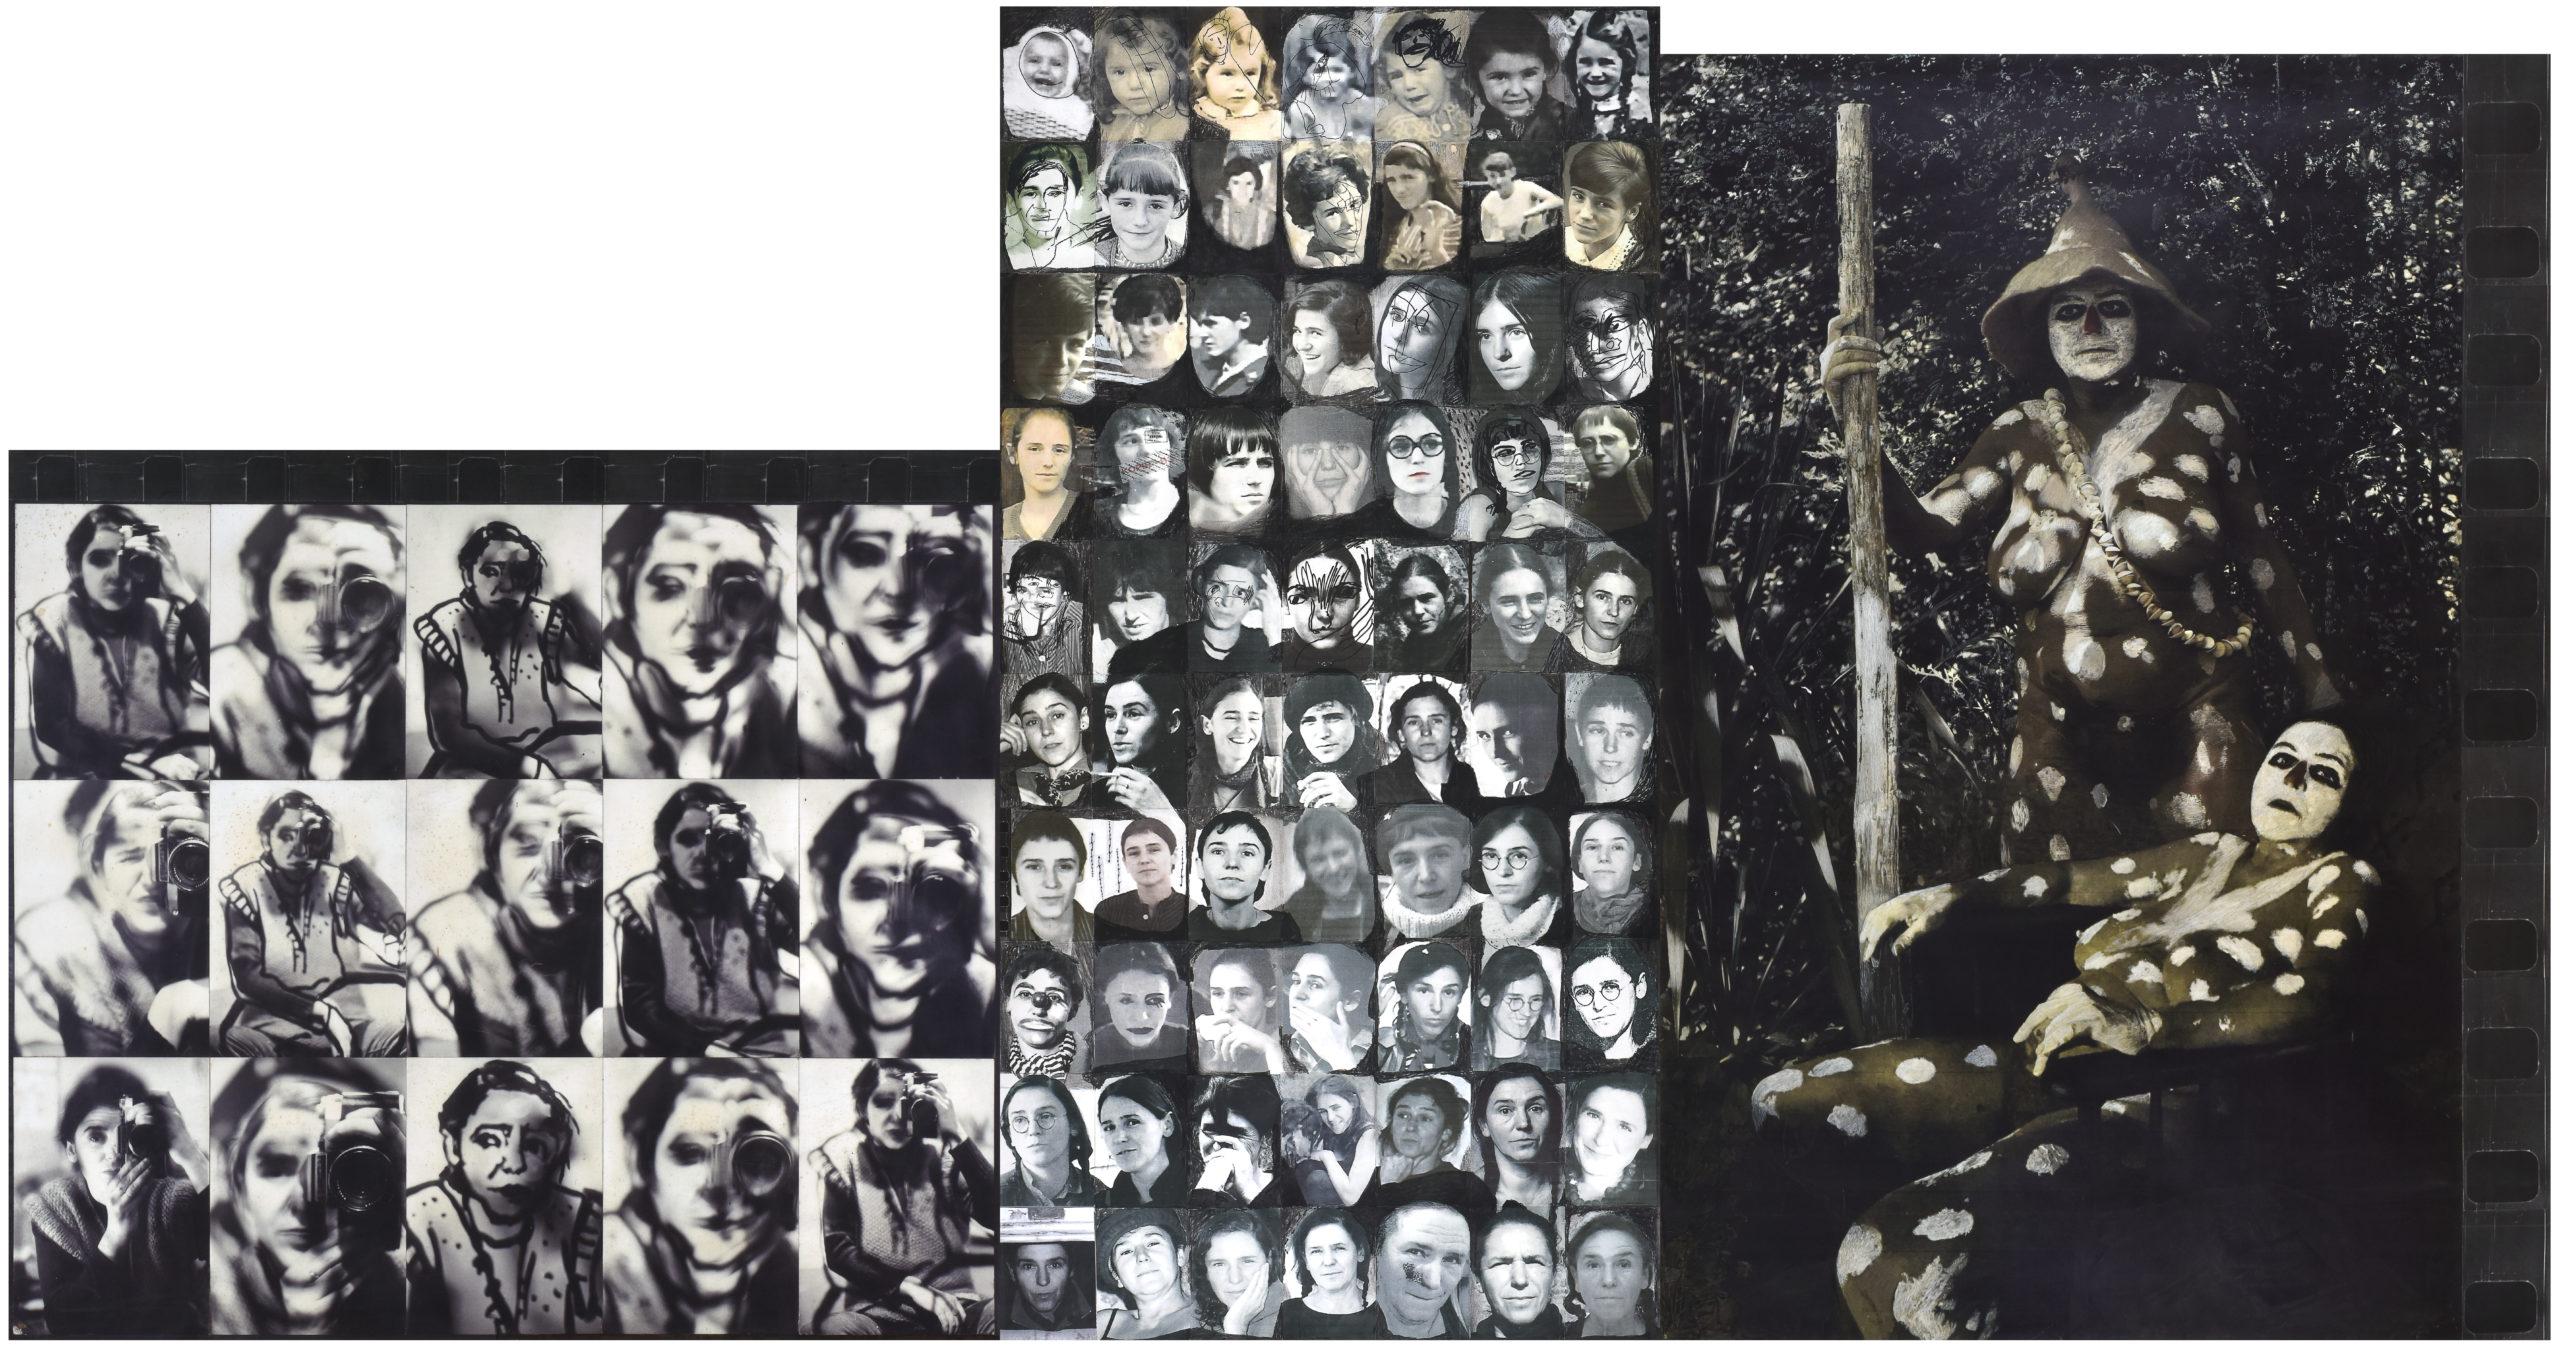 SELFIE 1949-2019 Brigitte Kühlewind Brennenstuhl © Musée d'Art Hyacinthe Rigaud / Pascale Marchesan